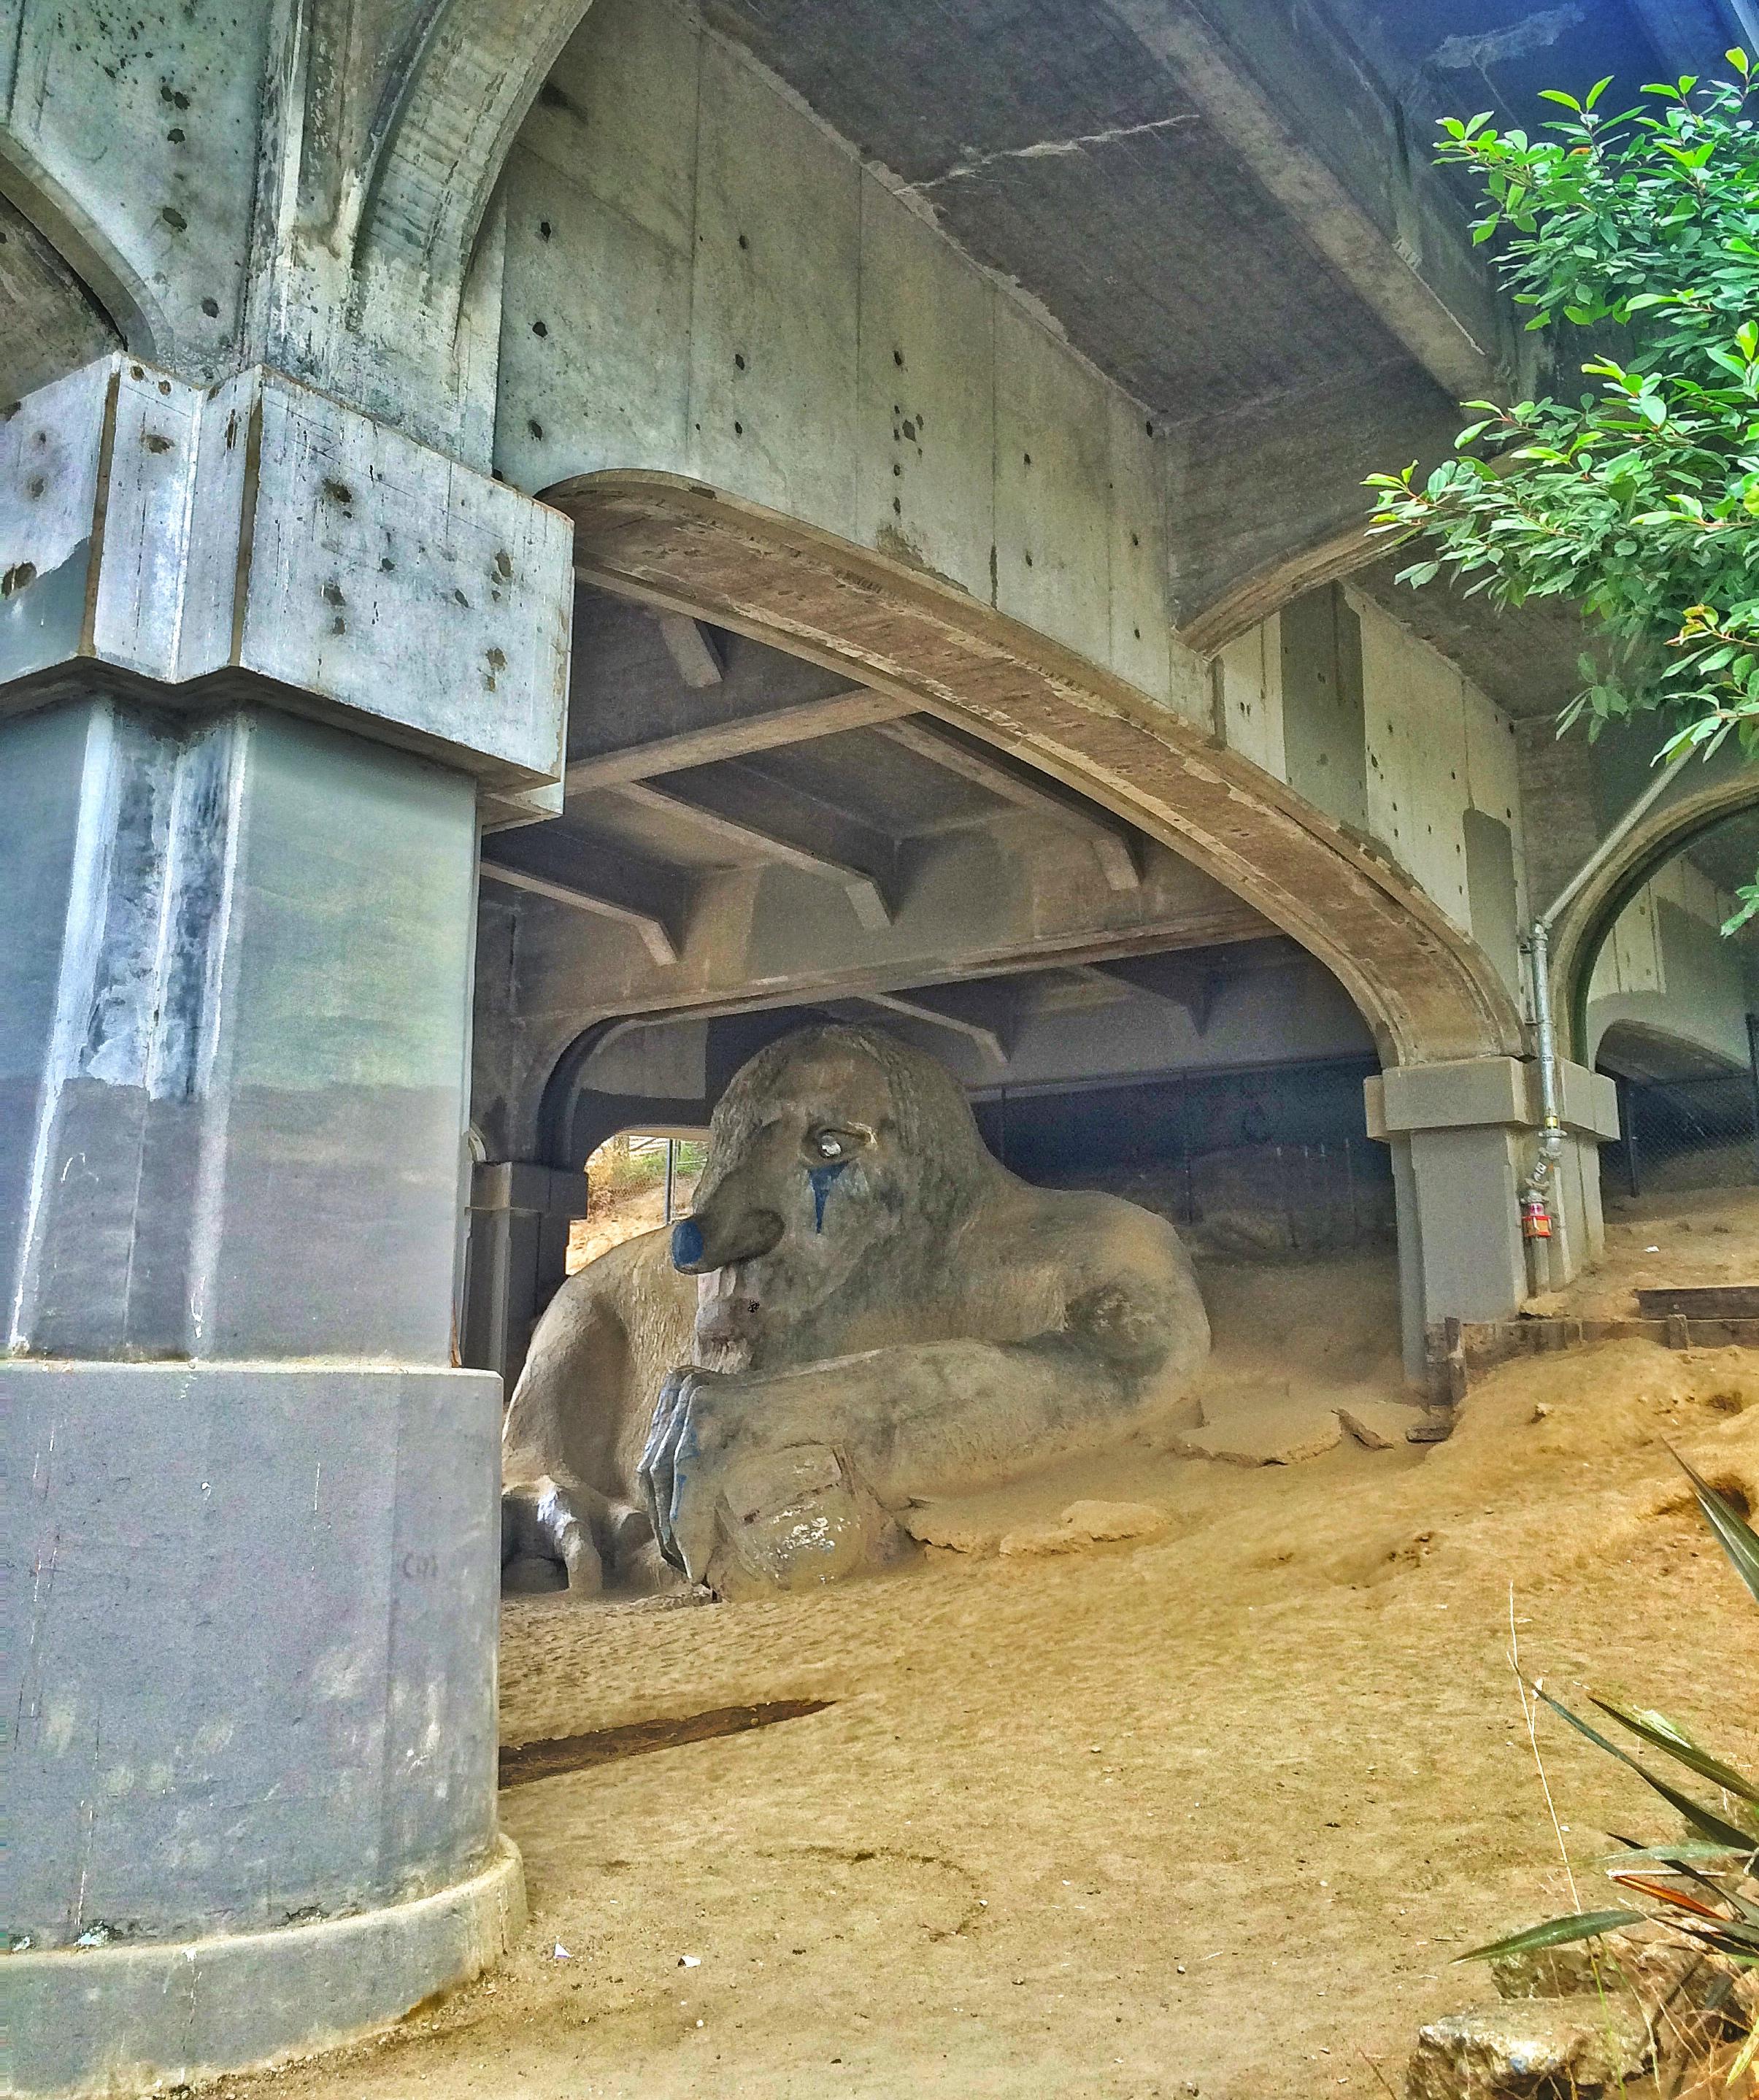 Under the Aurora Bridge, the Fremont Troll waits patiently.